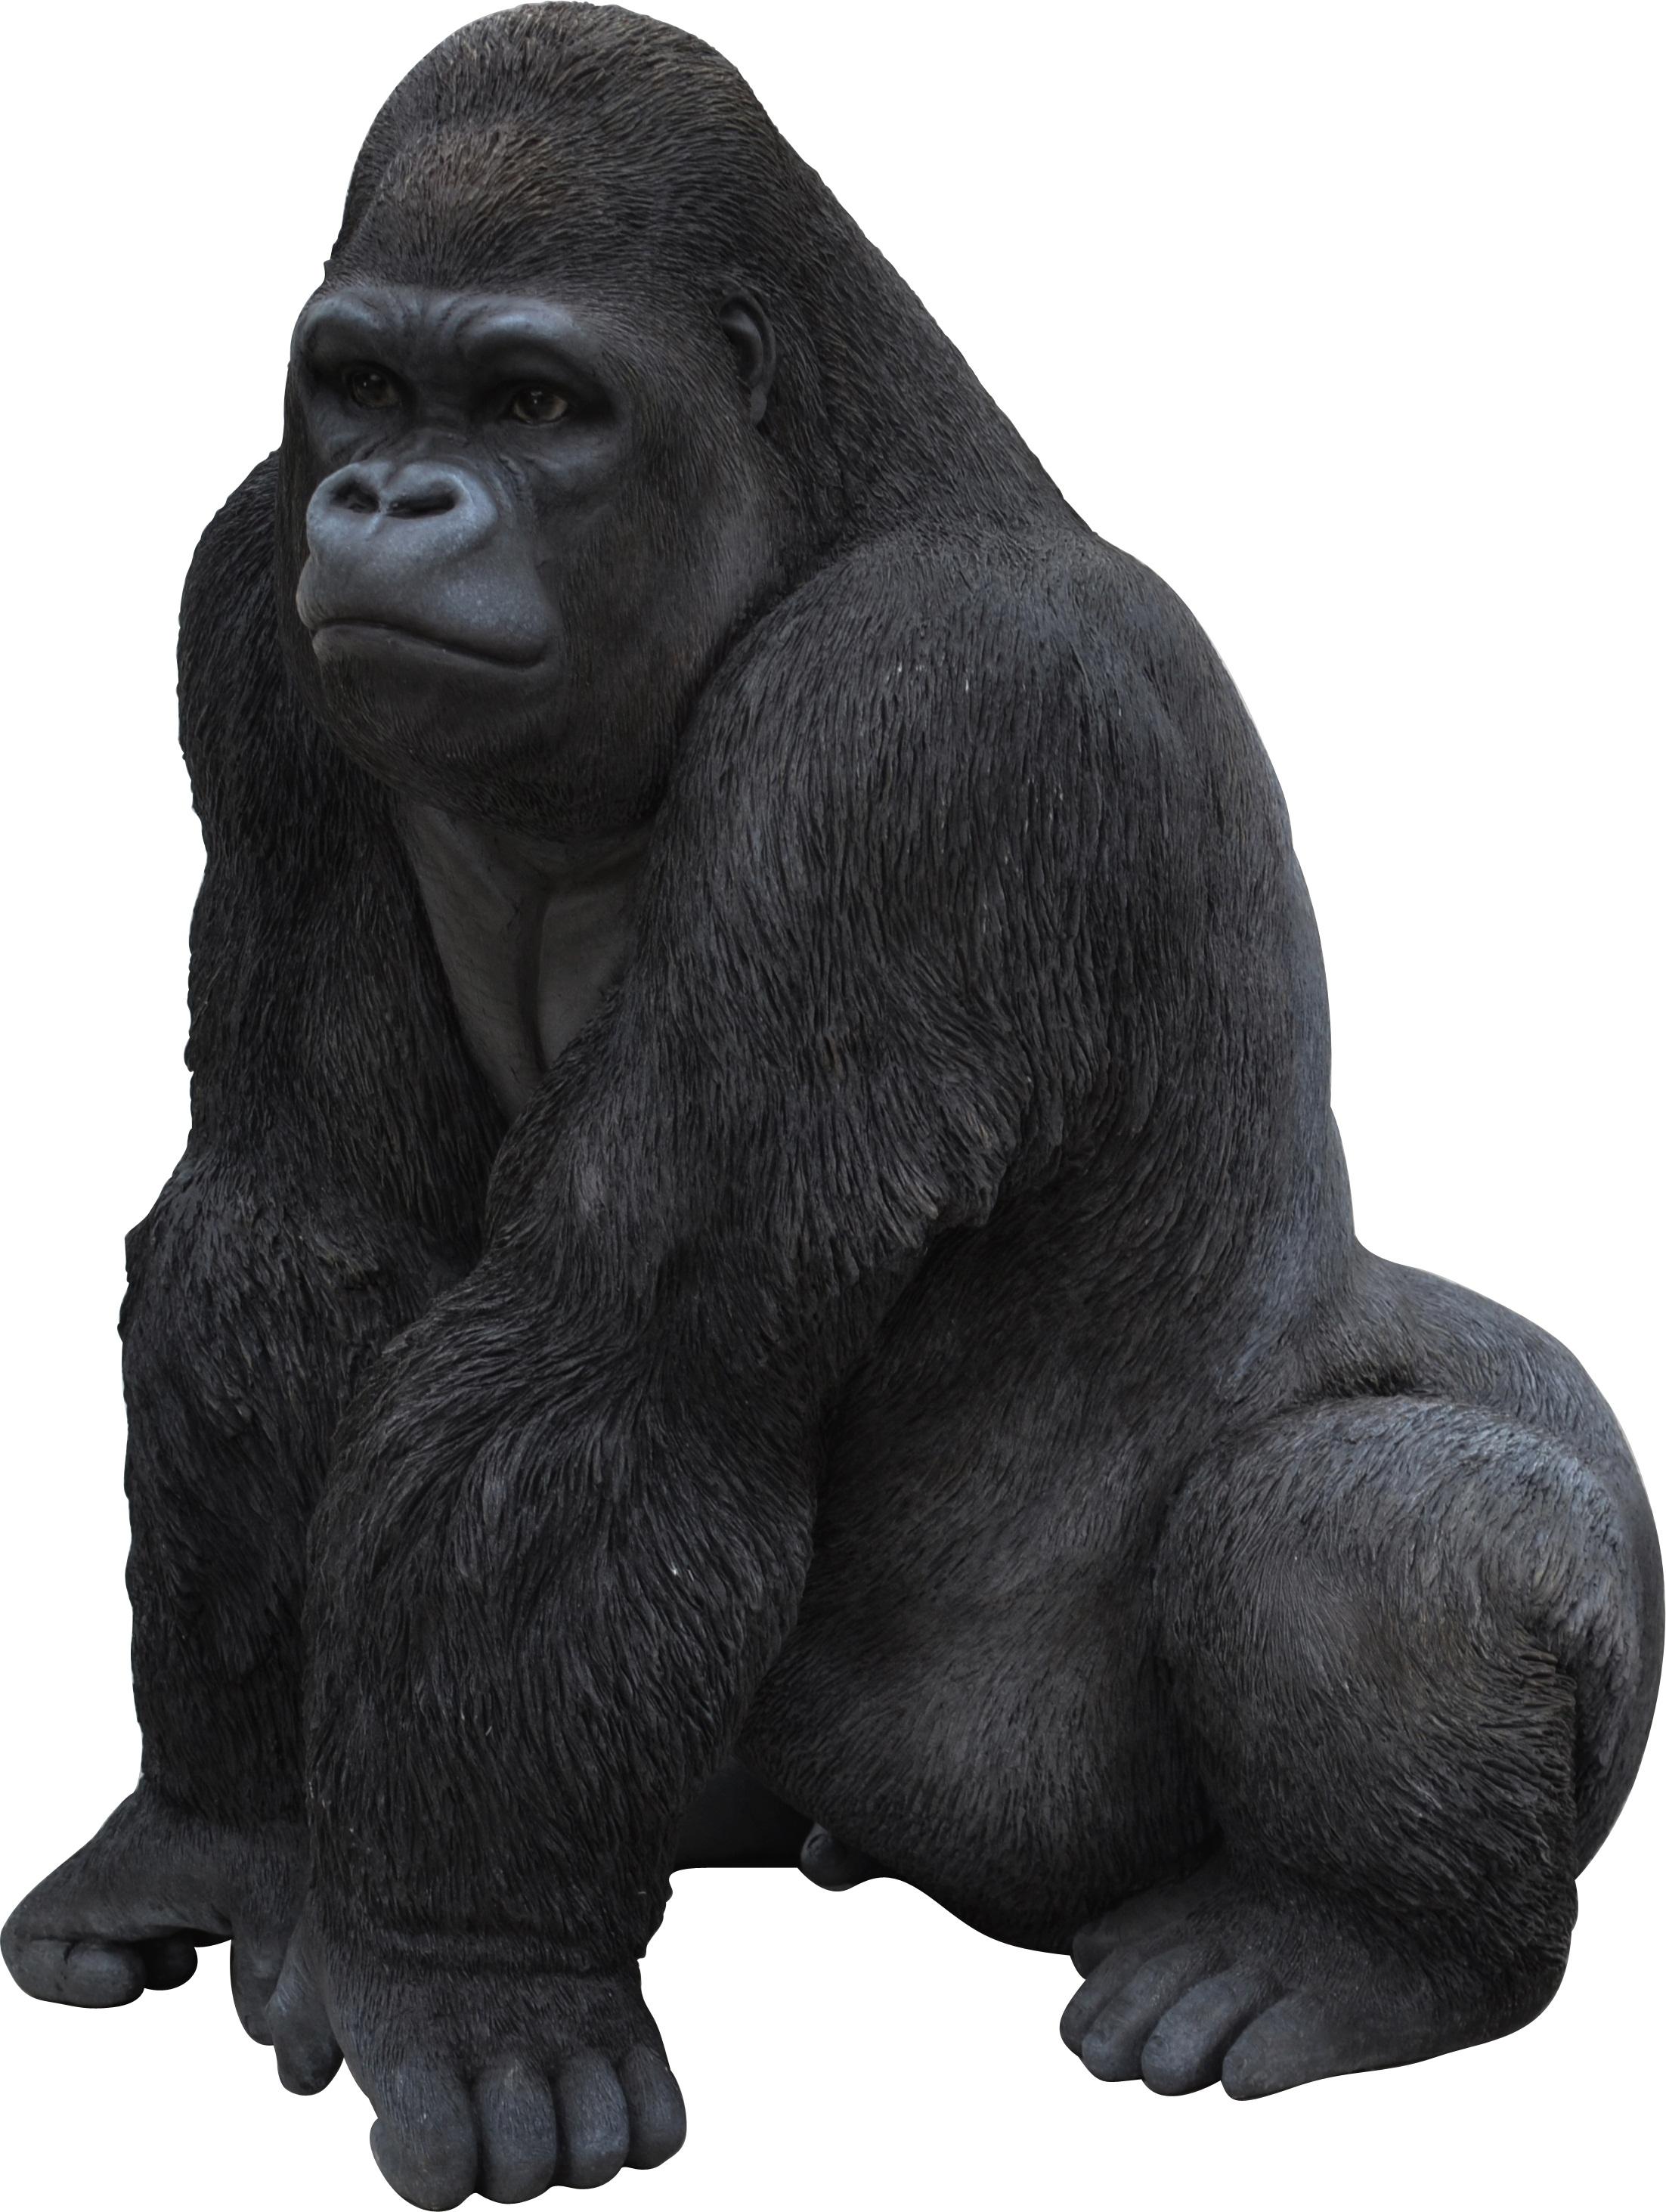 Gorilla PNG Transparent #37857.